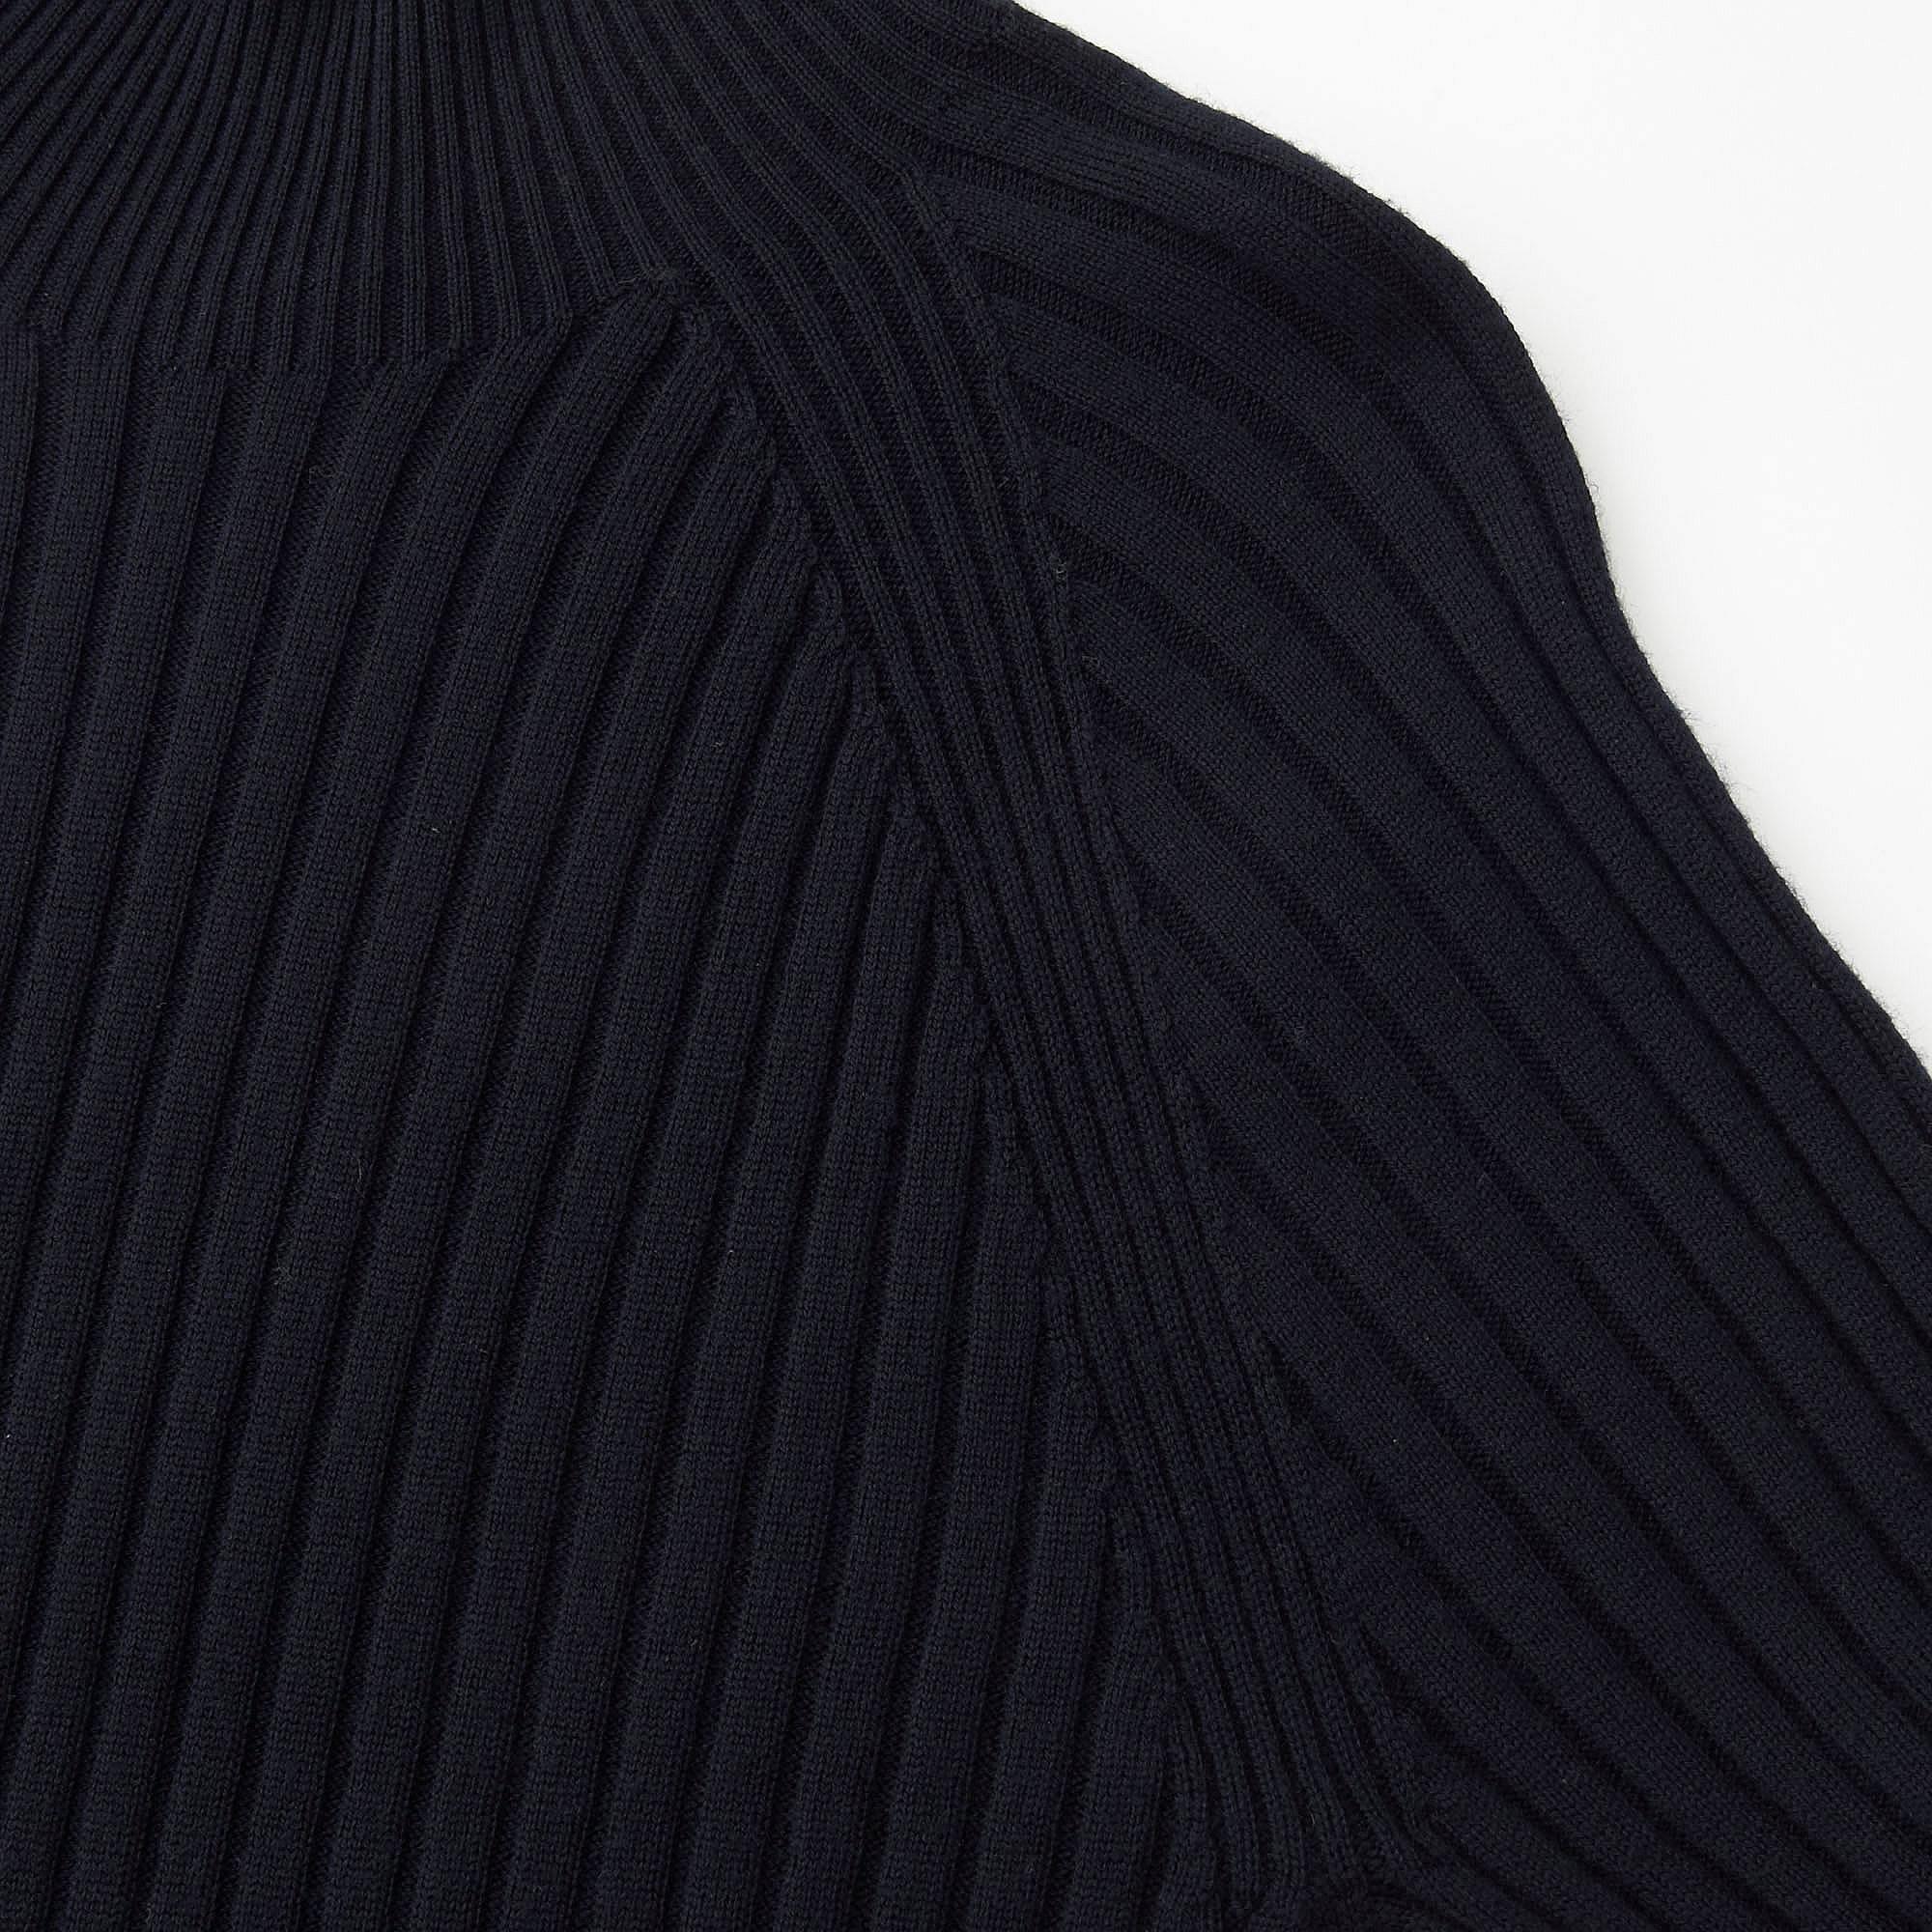 930beed8c54 Uniqlo WOMEN 3D EXTRA FINE MERINO RIBBED LONG SLEEVE DRESS at £59.9 ...